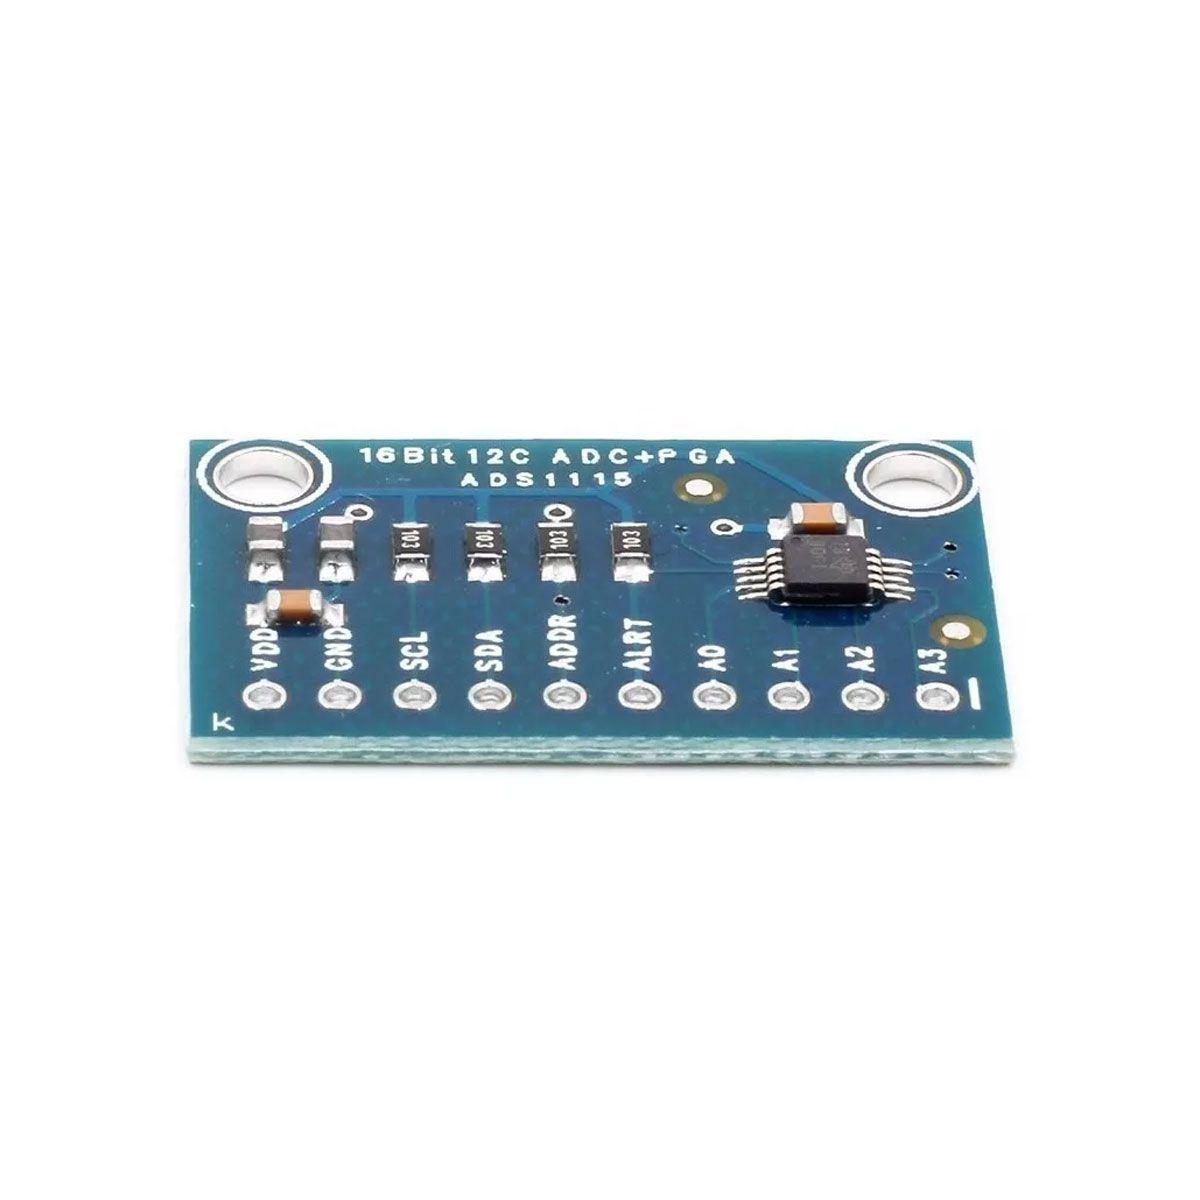 Modulo Conversor Analógico Digital ADC ADS1115 | 16 Bit i2C